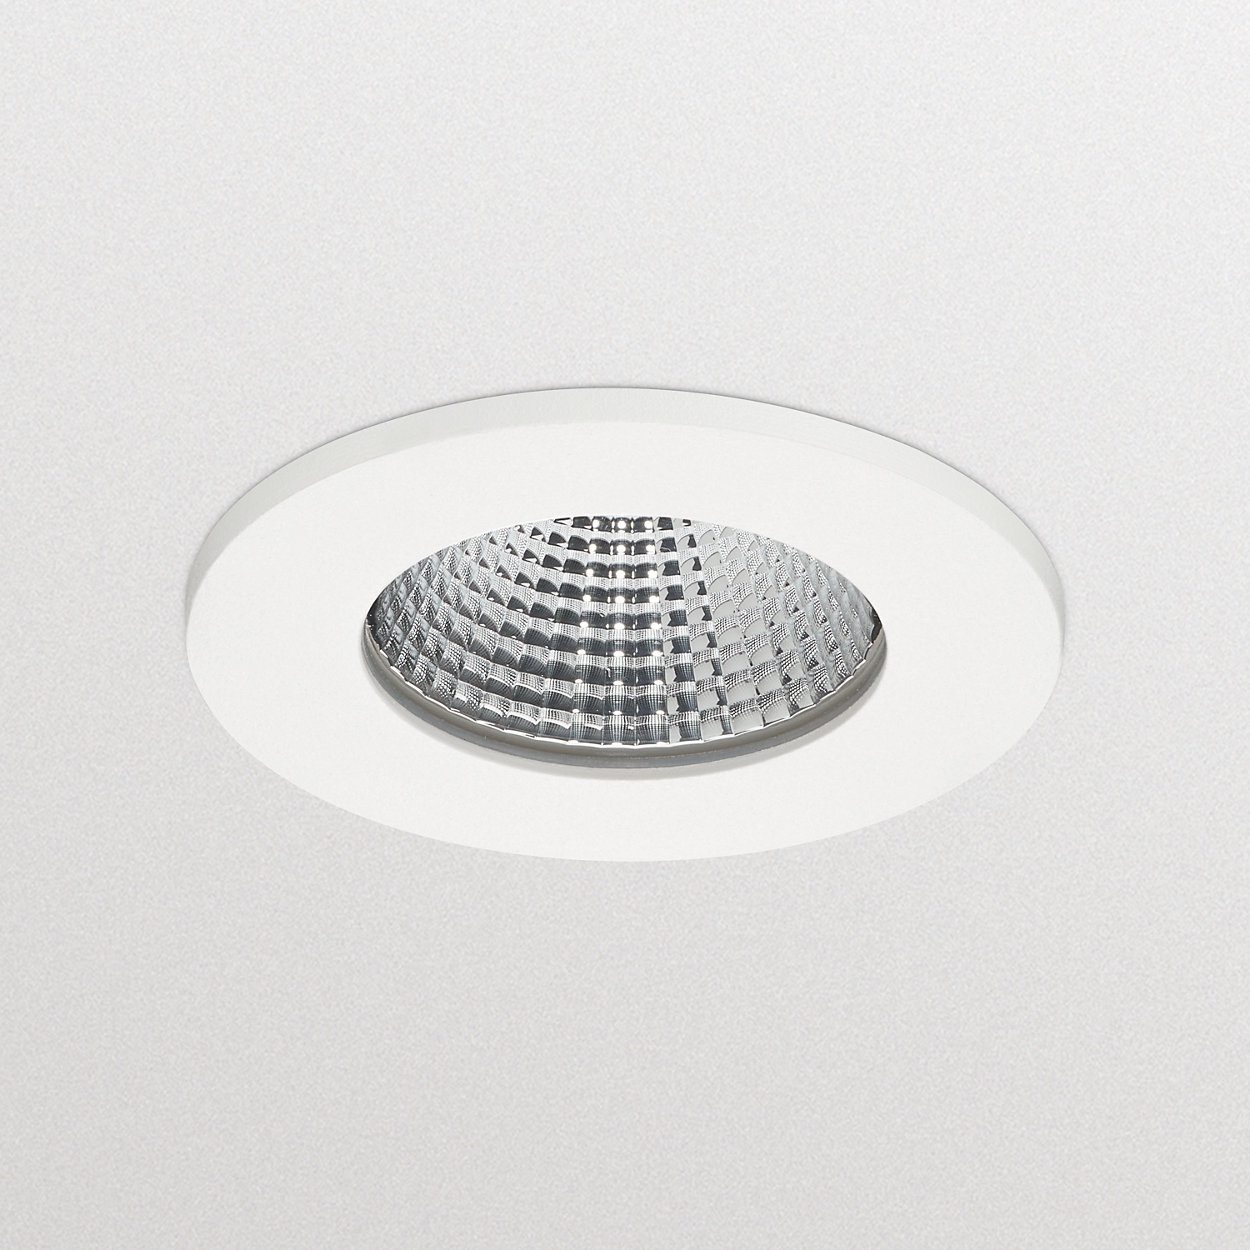 ClearAccent - Οικονομικό χωνευτό σποτ LED